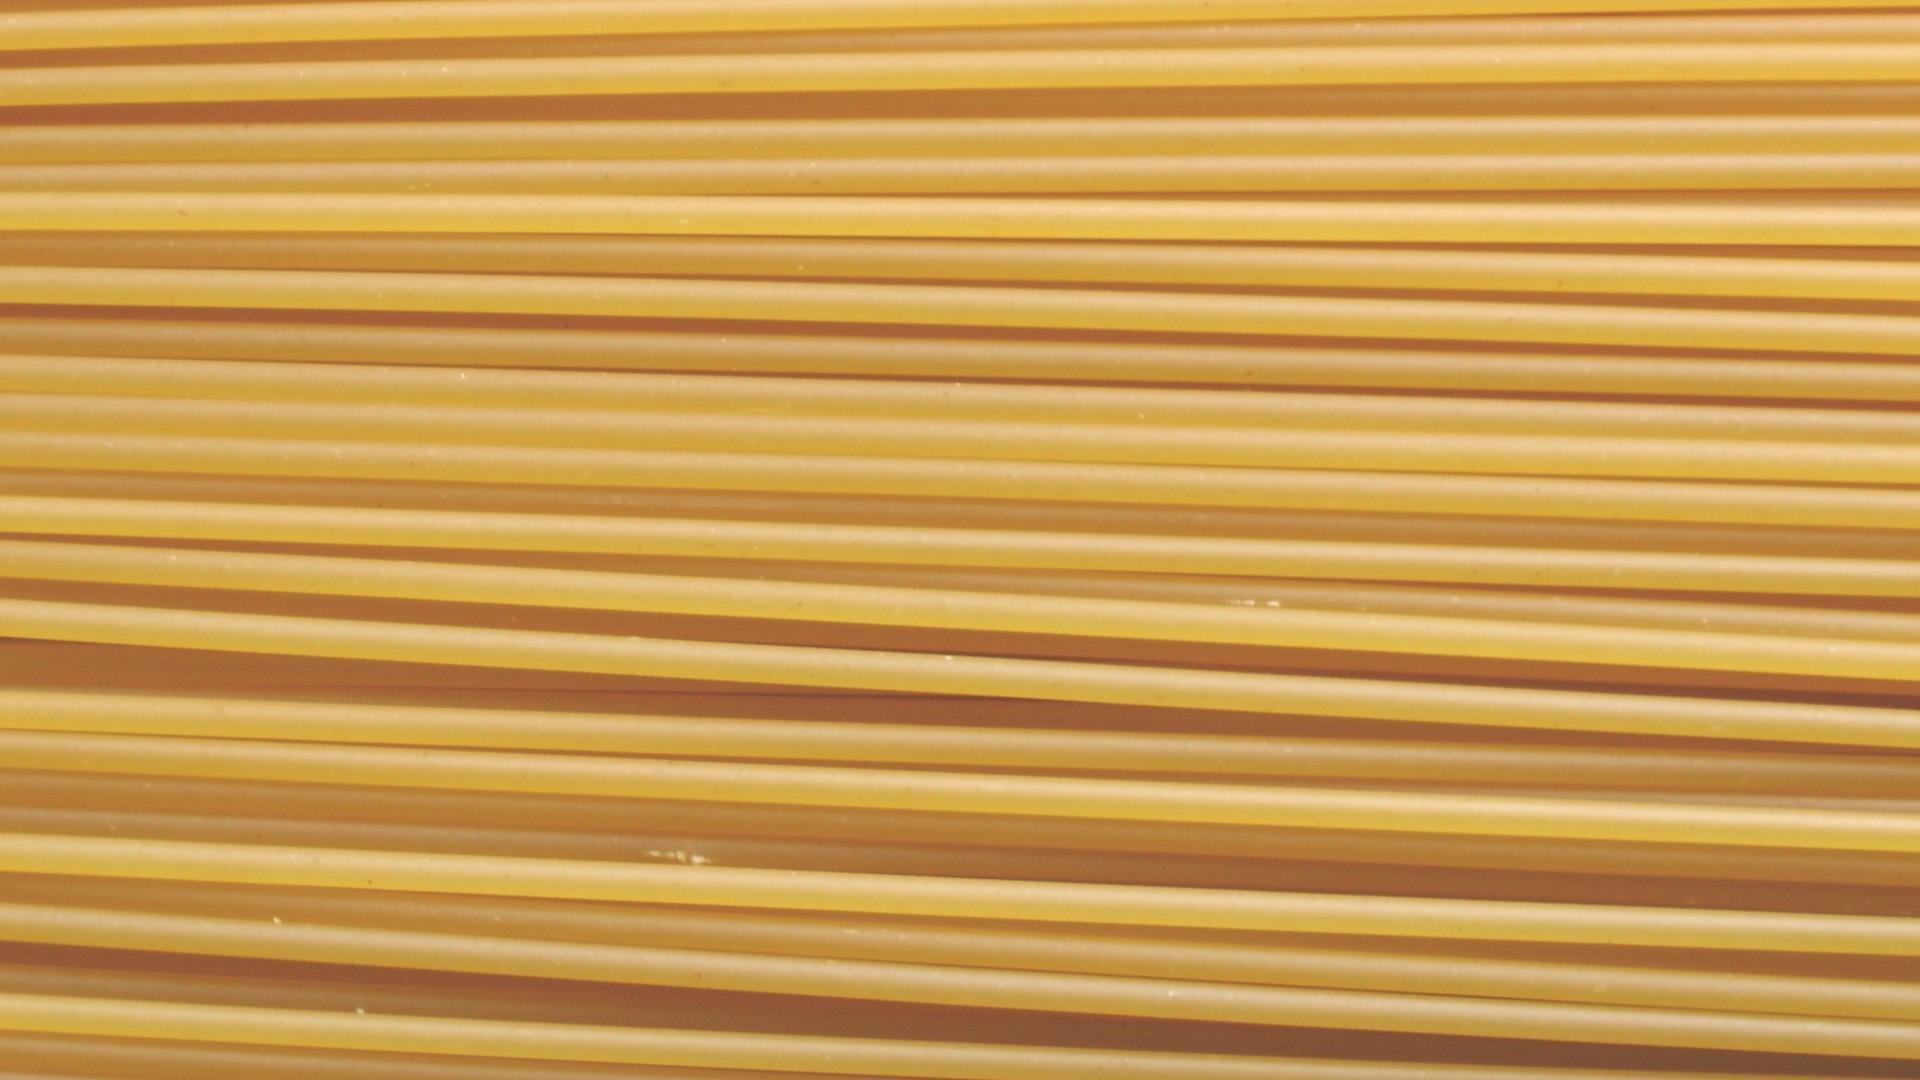 Fotos gratis : piso, techo, línea, comida, cocina, amarillo ...